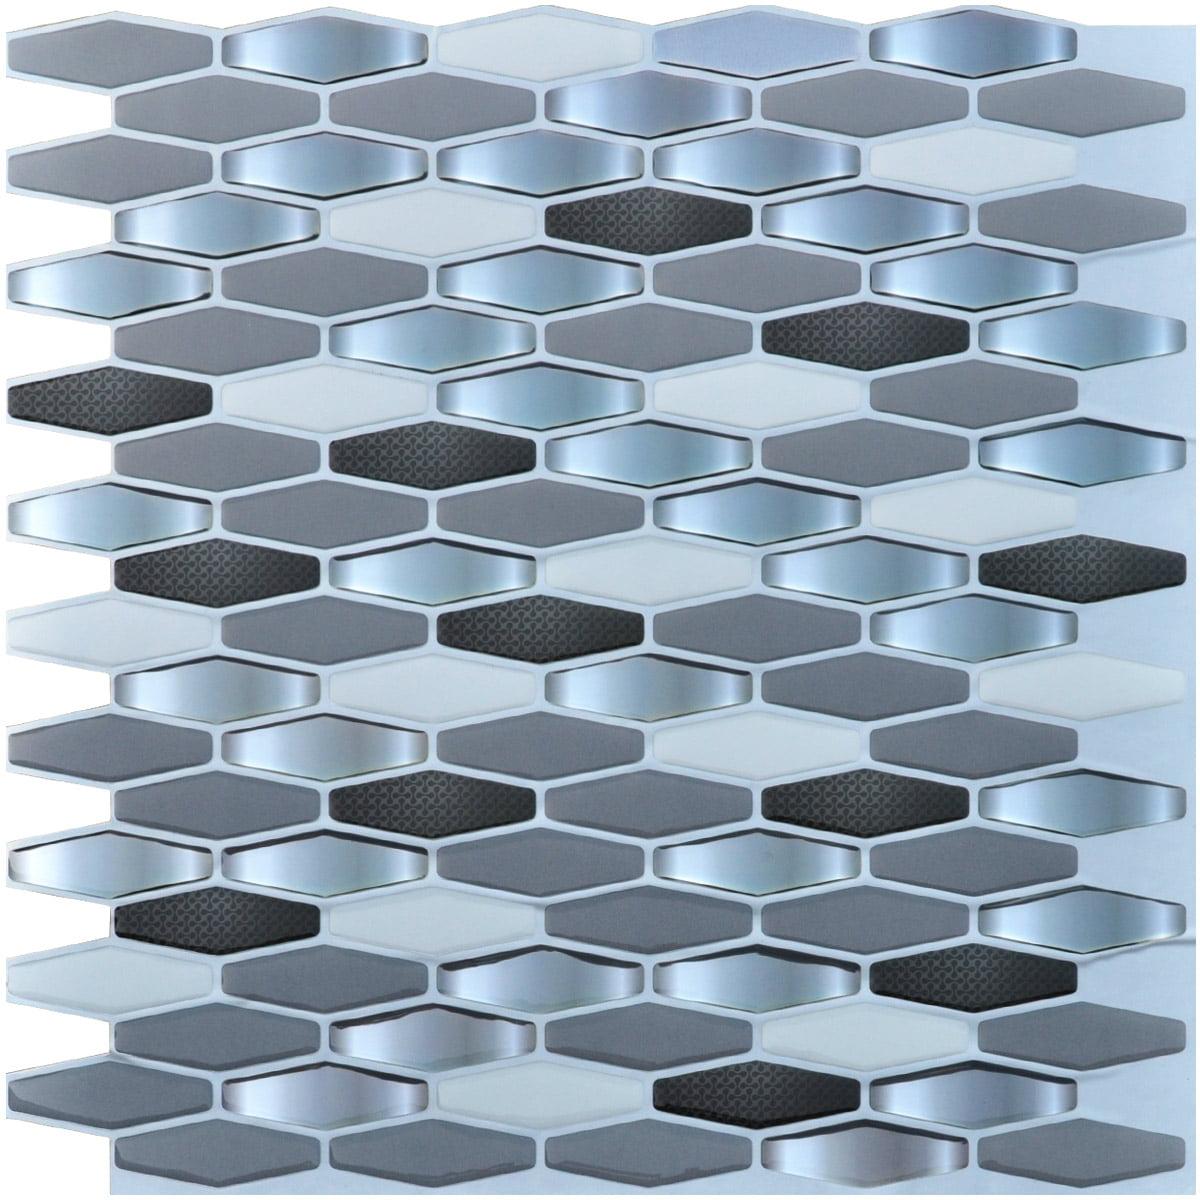 Art3d Peel & Stick Brick Kitchen Backsplash Self-adhesive Wall Tile ...